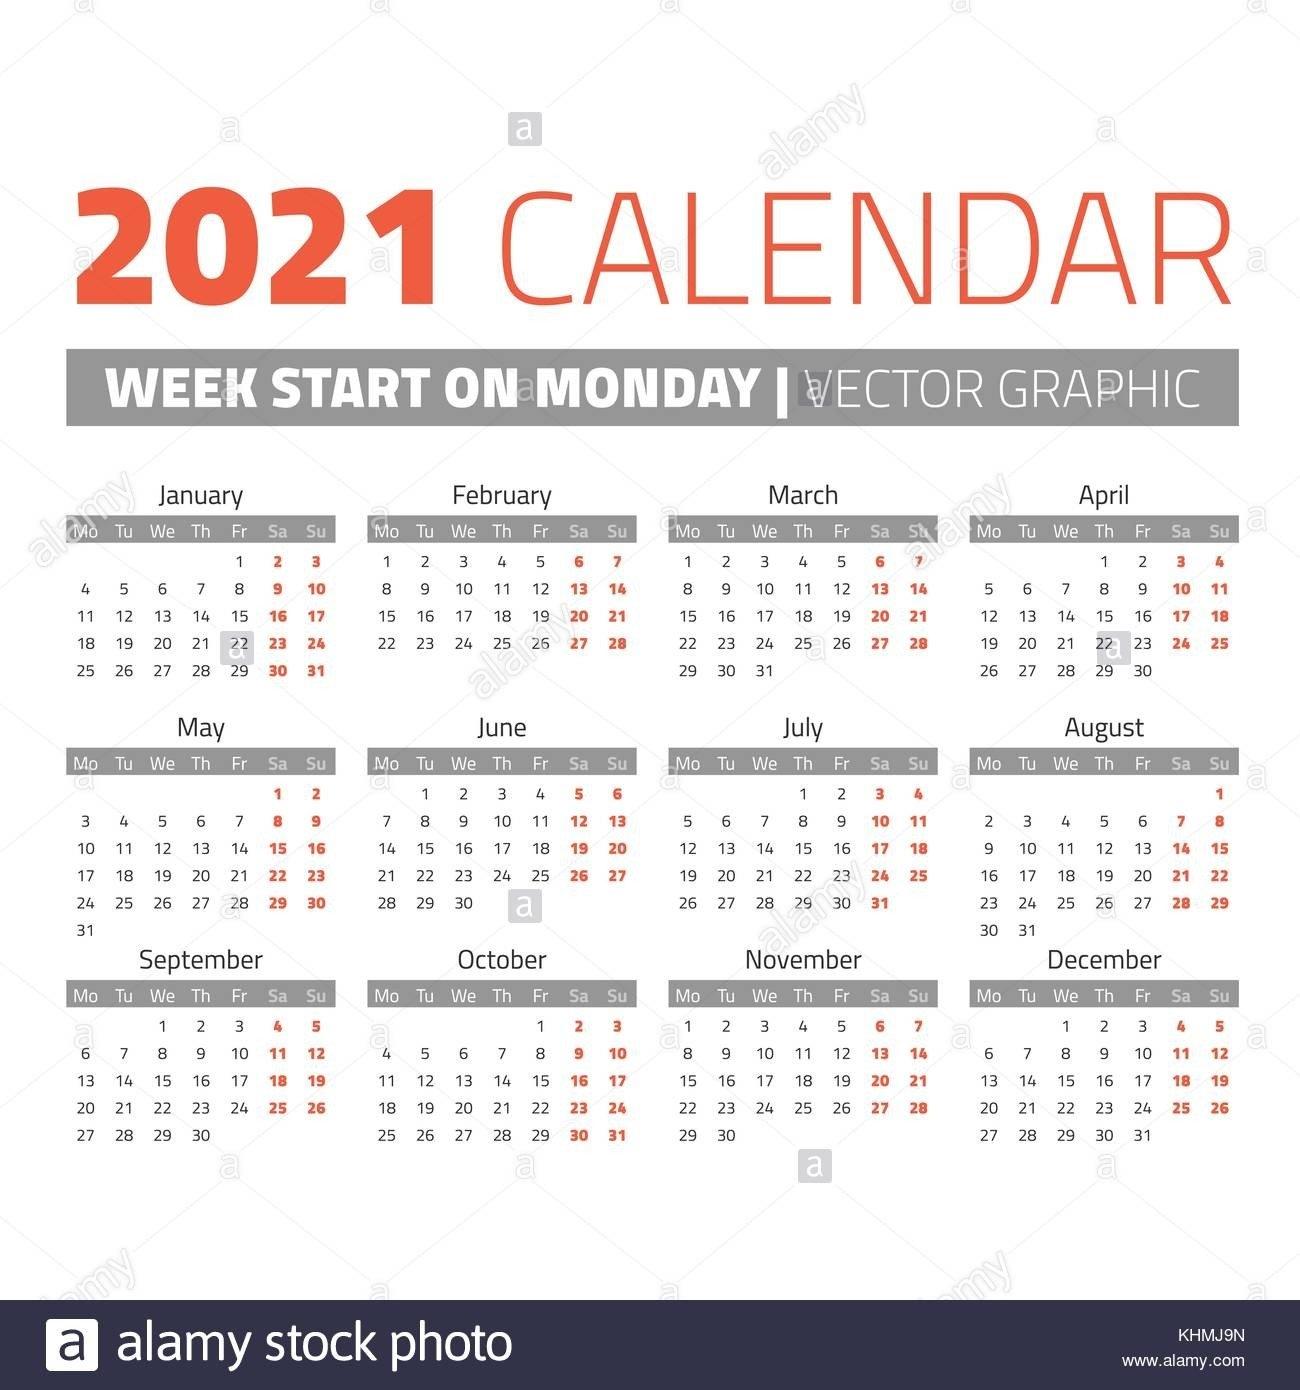 Editable Calendar 2021 Broadcast | Free Printable Calendar Monthly with 2021 Broadcast Calendar For Media